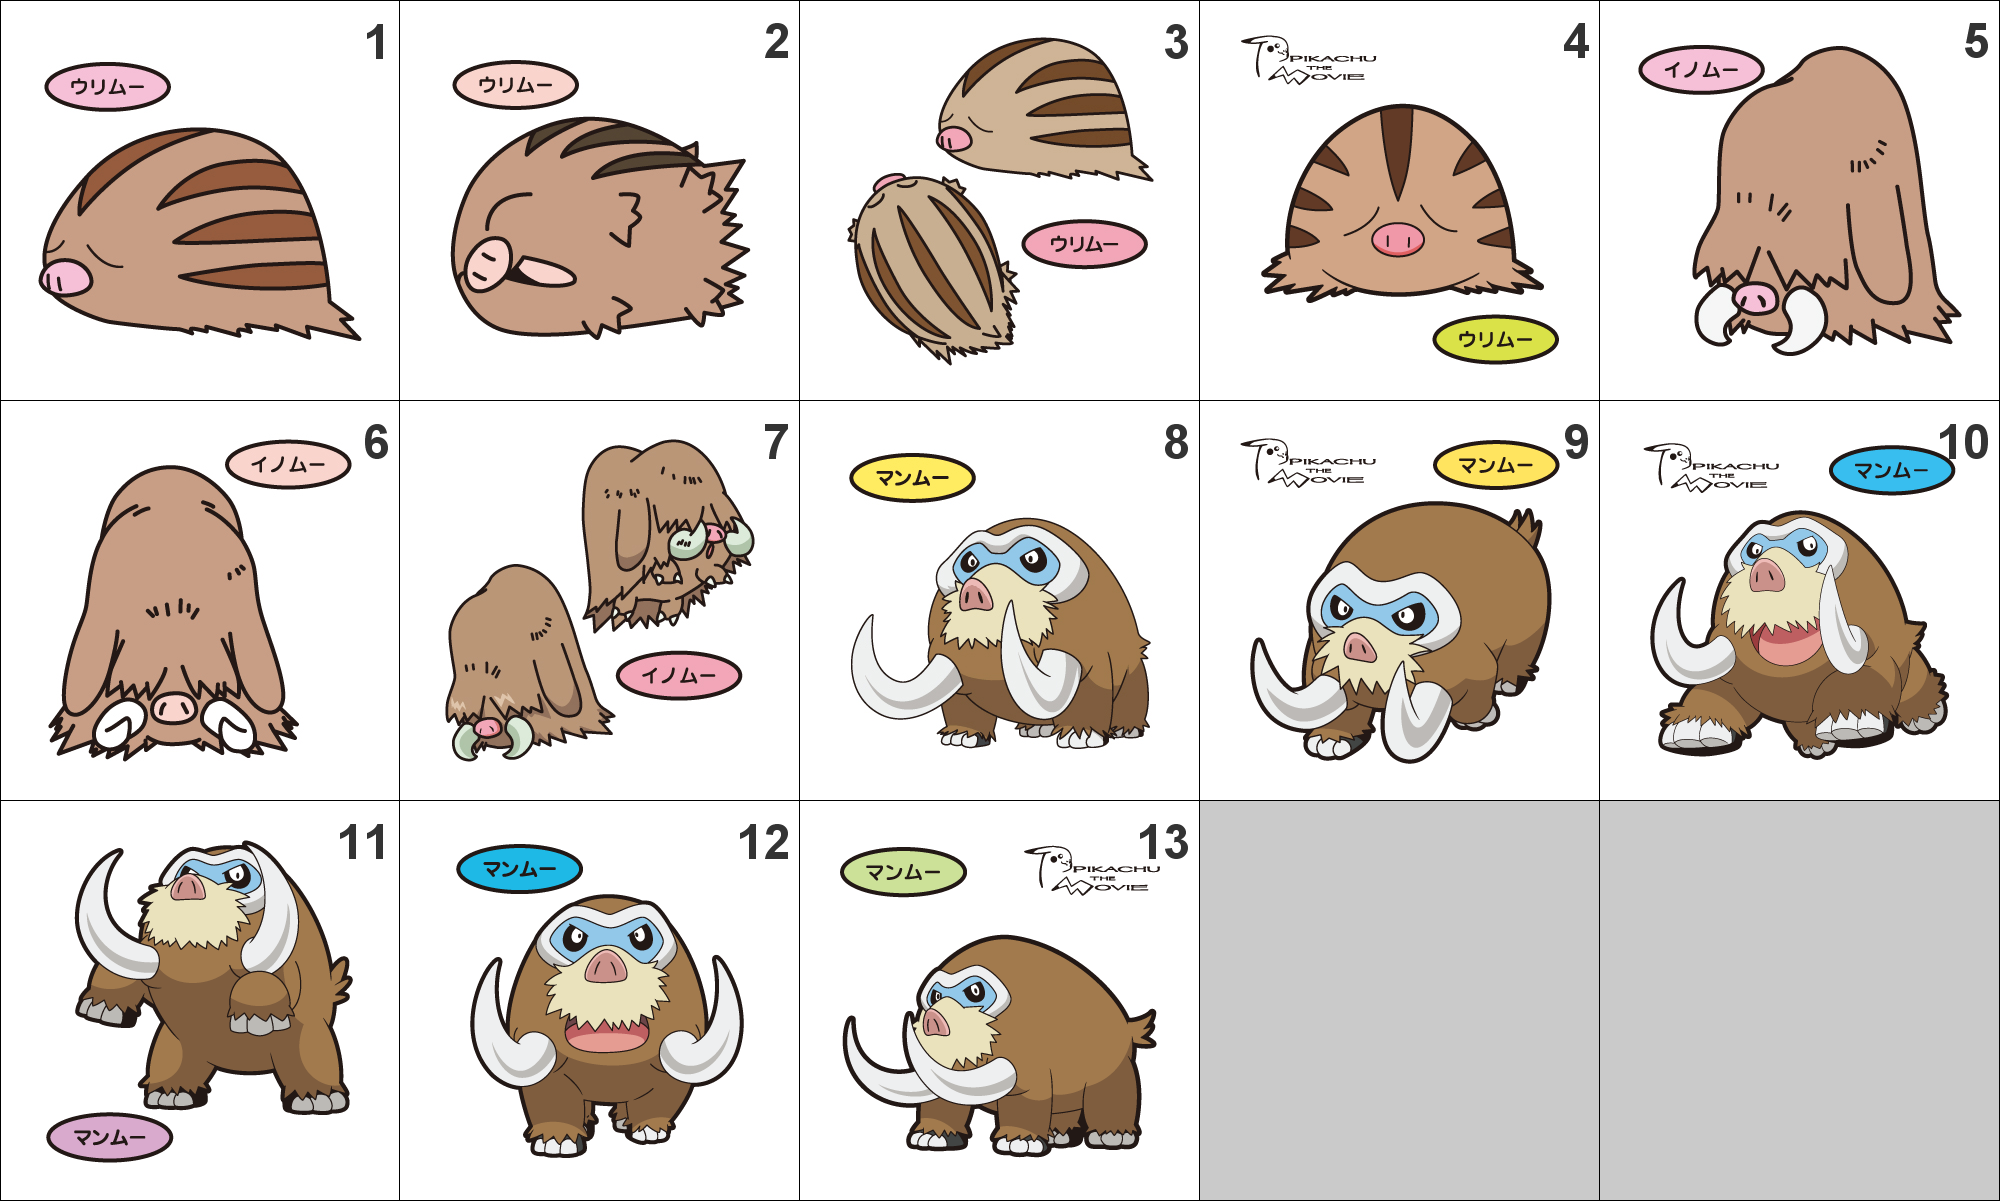 220 221 473 swinub piloswine mamoswine pan stickers pokemon